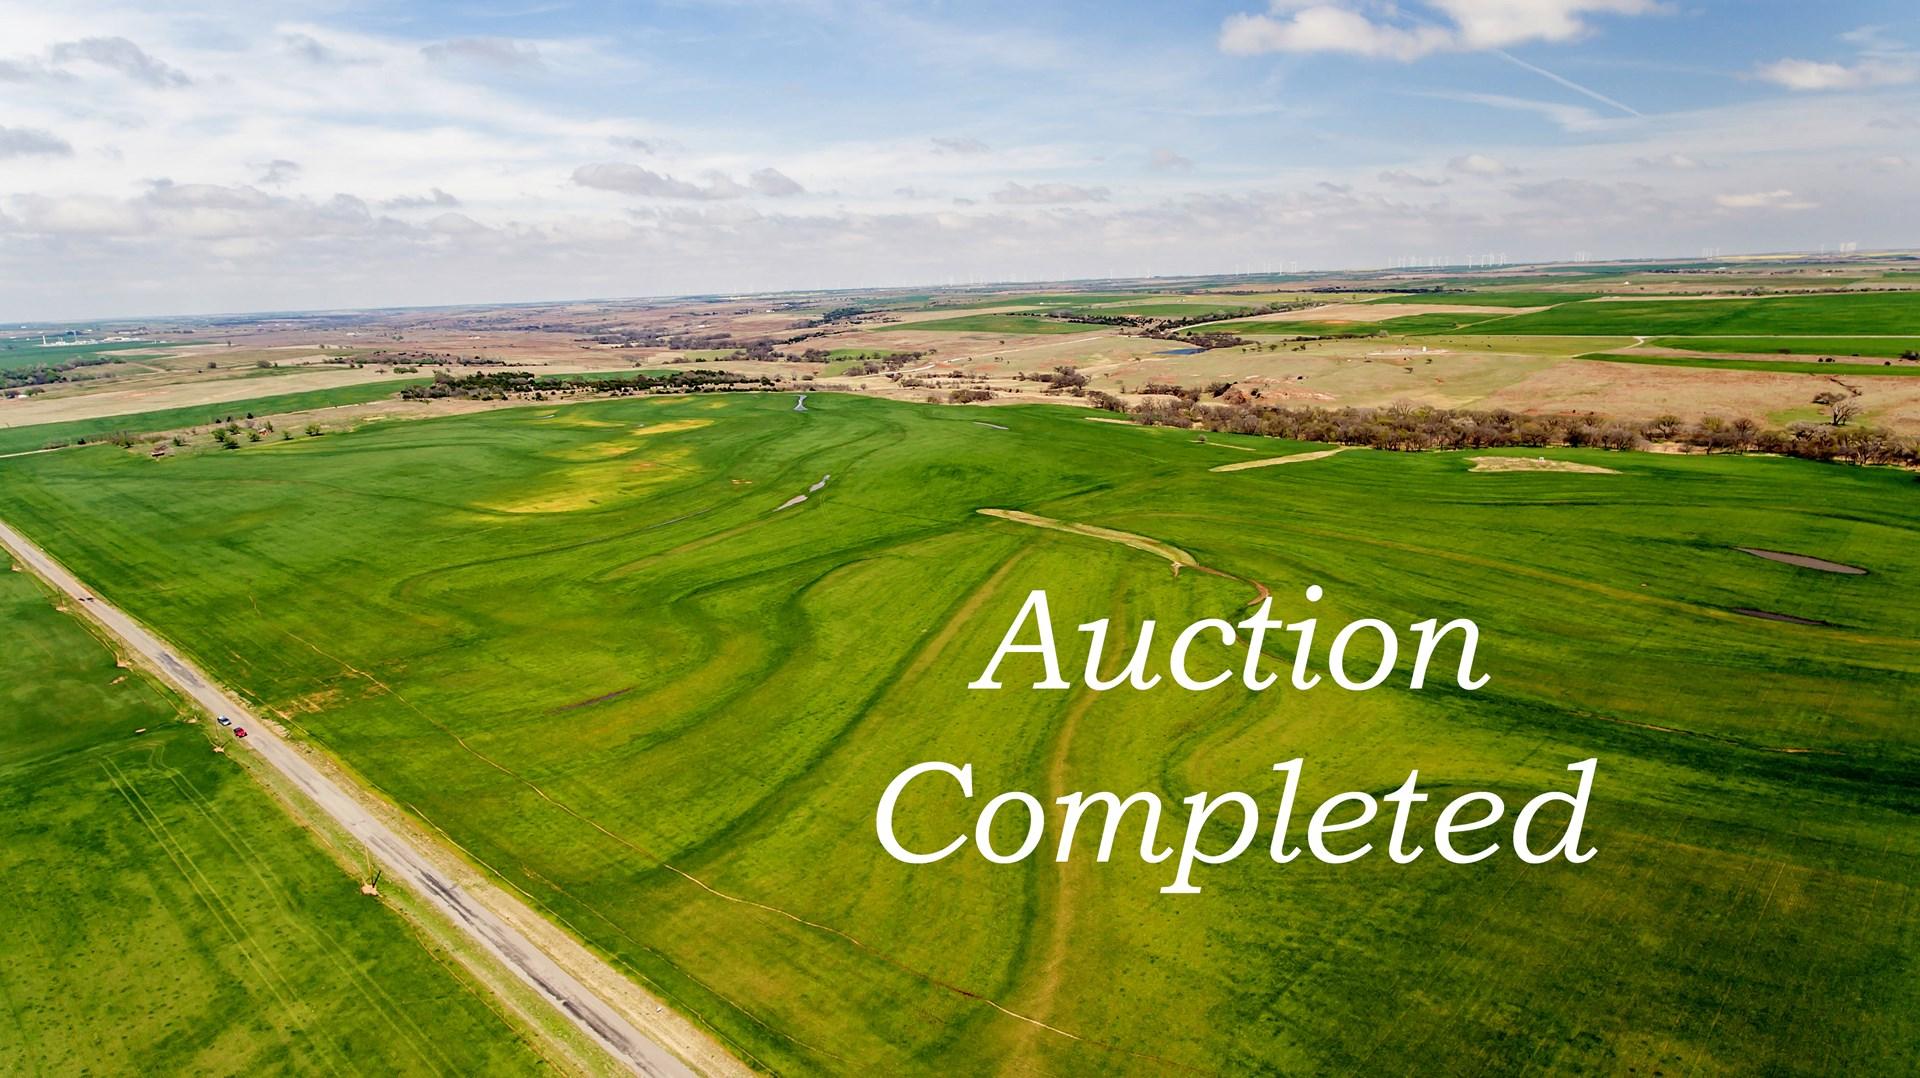 Oklahoma Farms for Sale, Washita County, Hunting/Recreationa